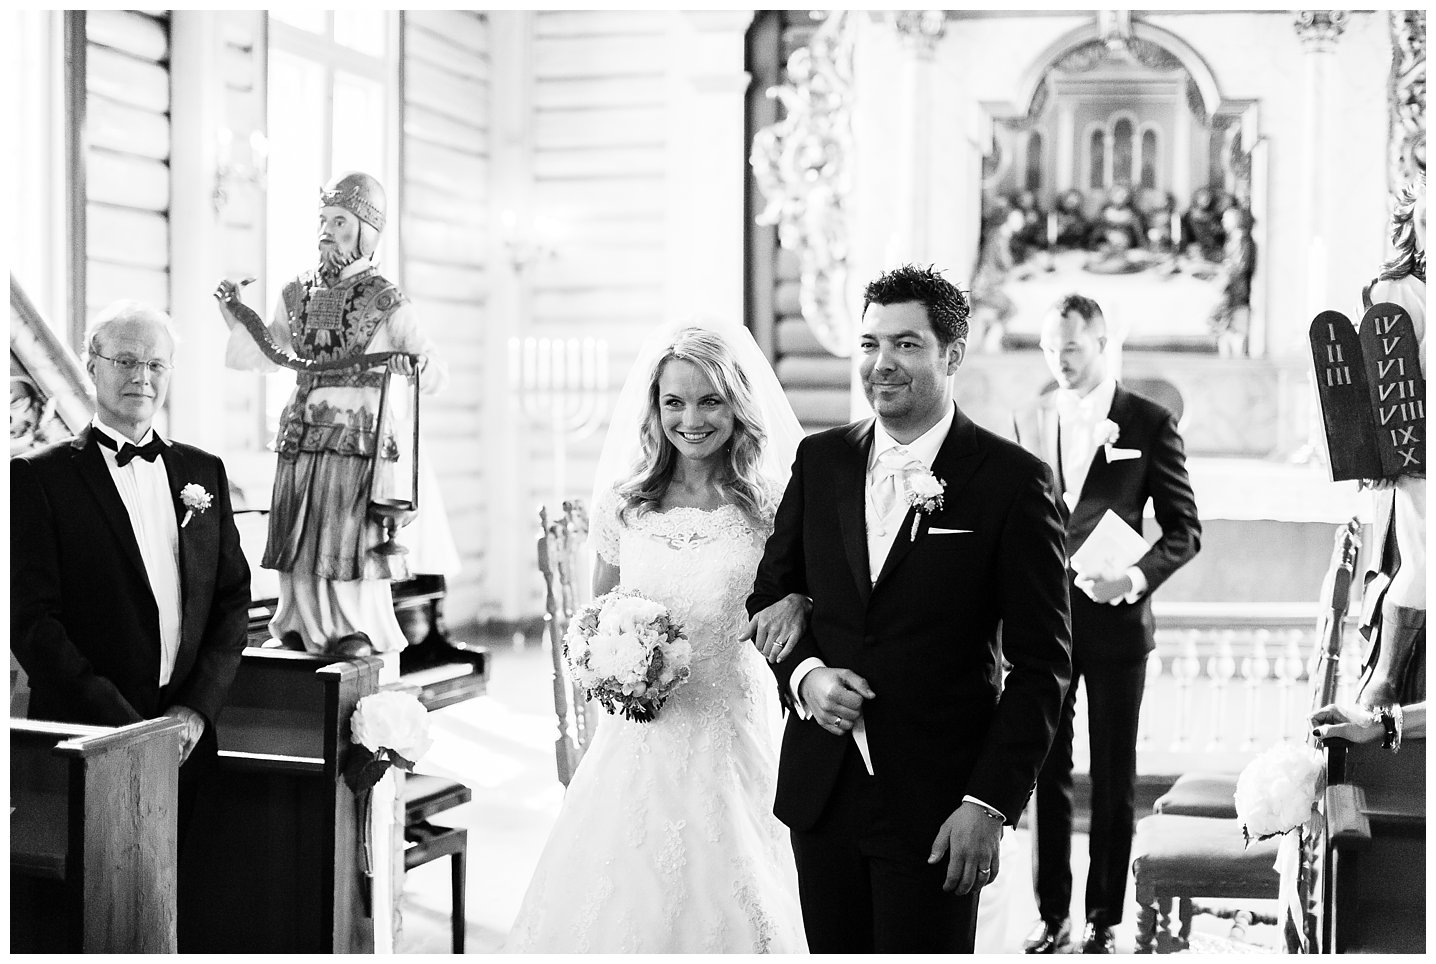 Fotograf-Eline-Jacobine-Bryllup-Villa-Malla-Camilla-og-Alexander_0080